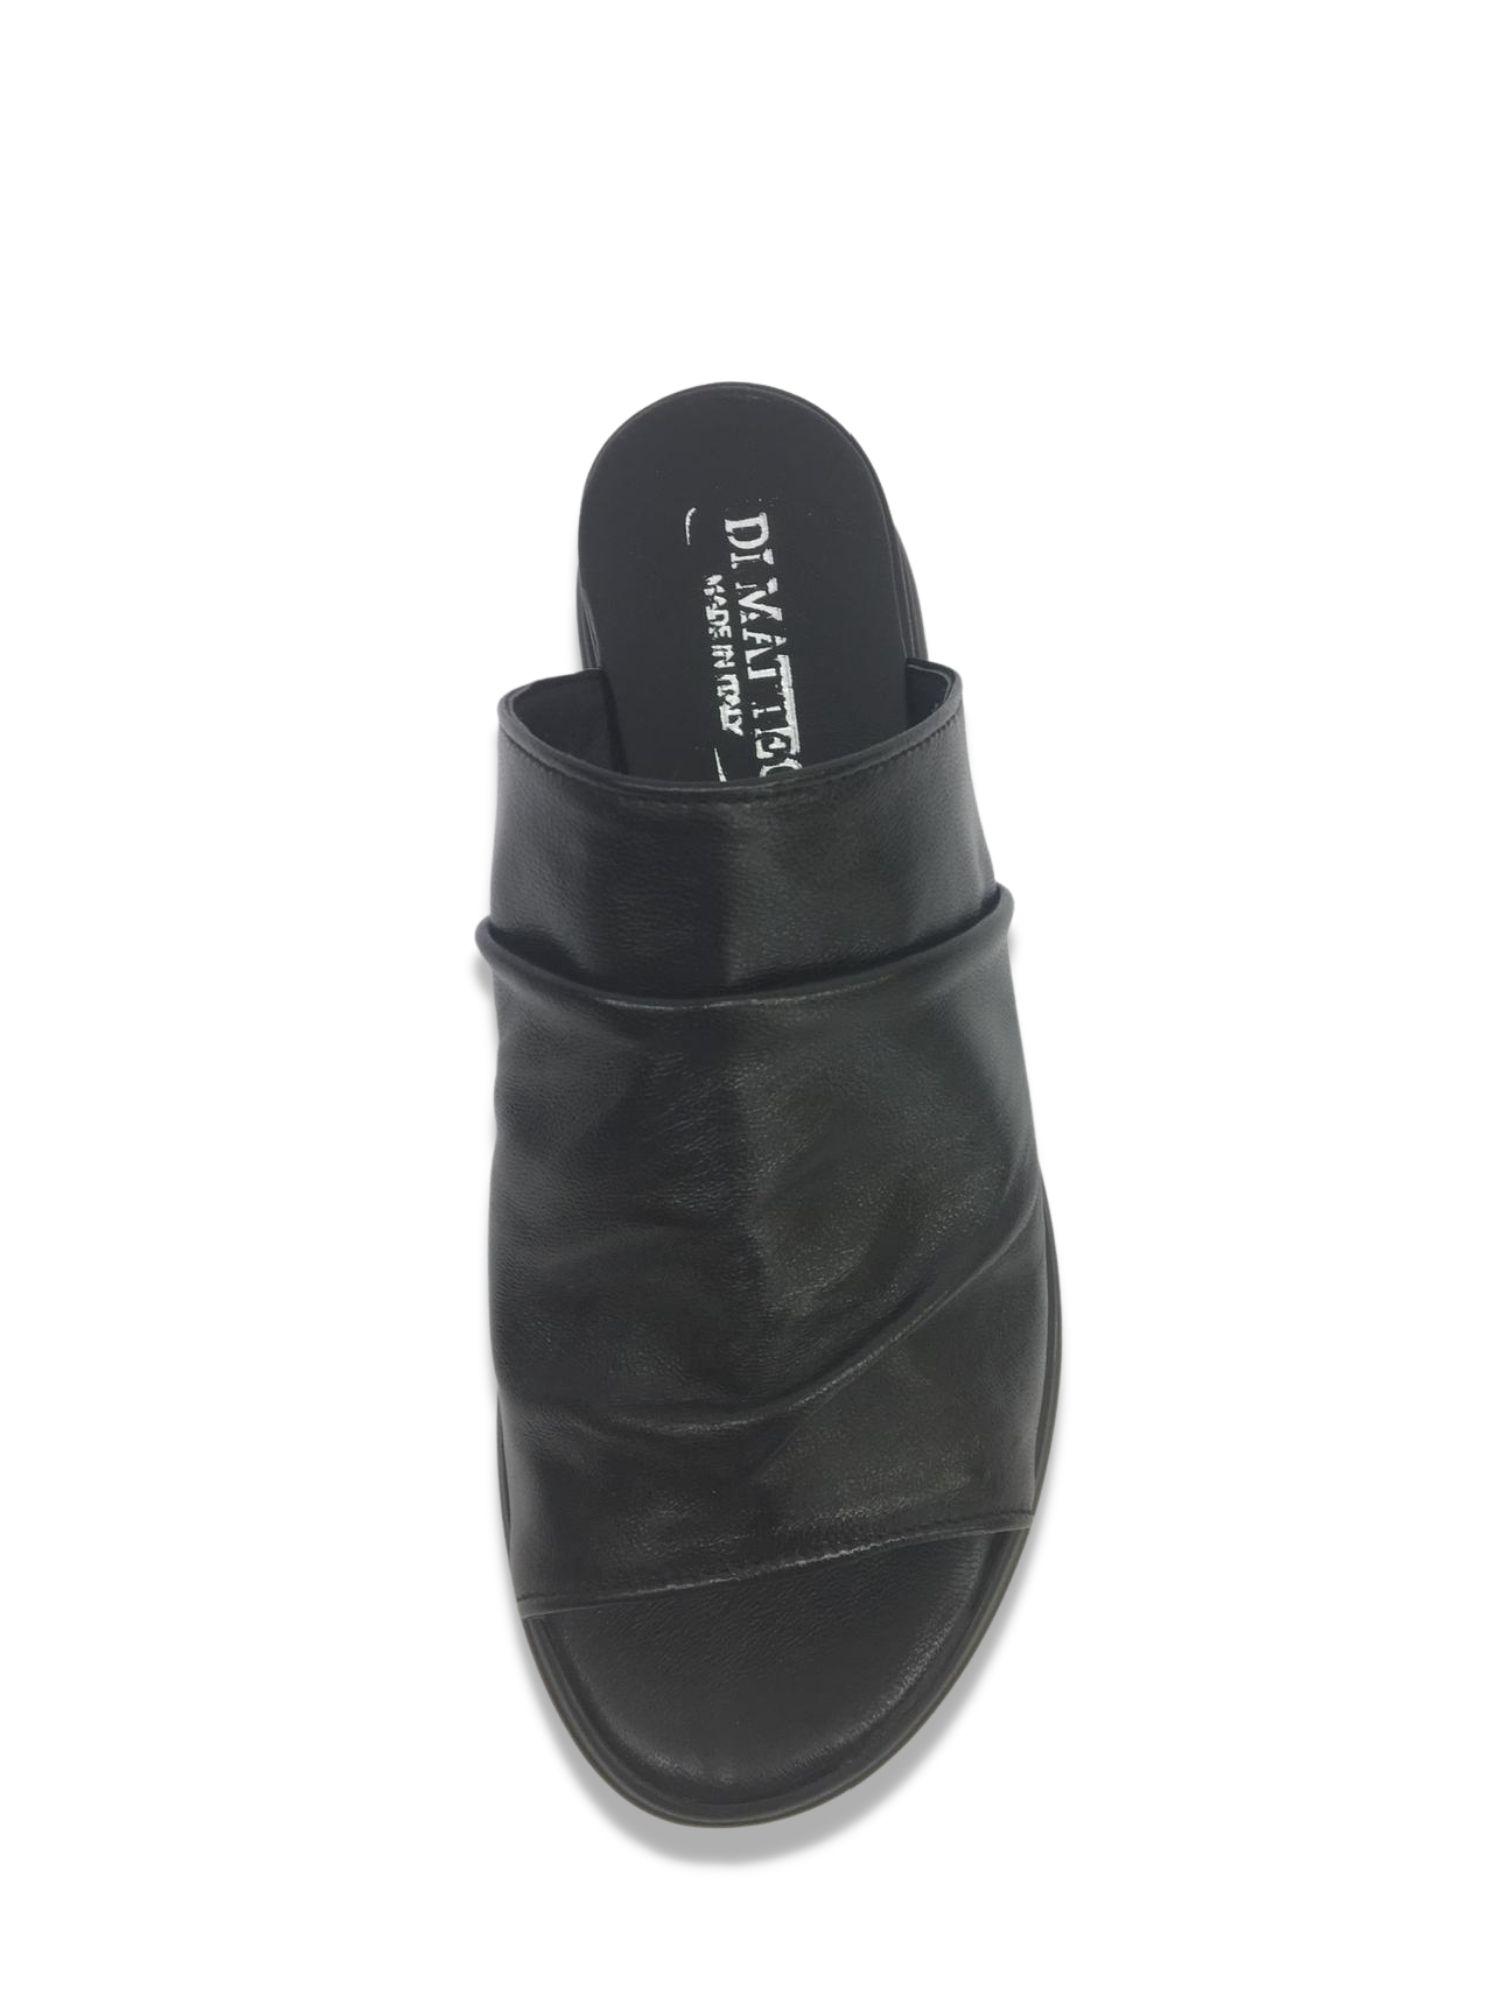 Sandalo Sabot Made in Italy 404 Nero alto